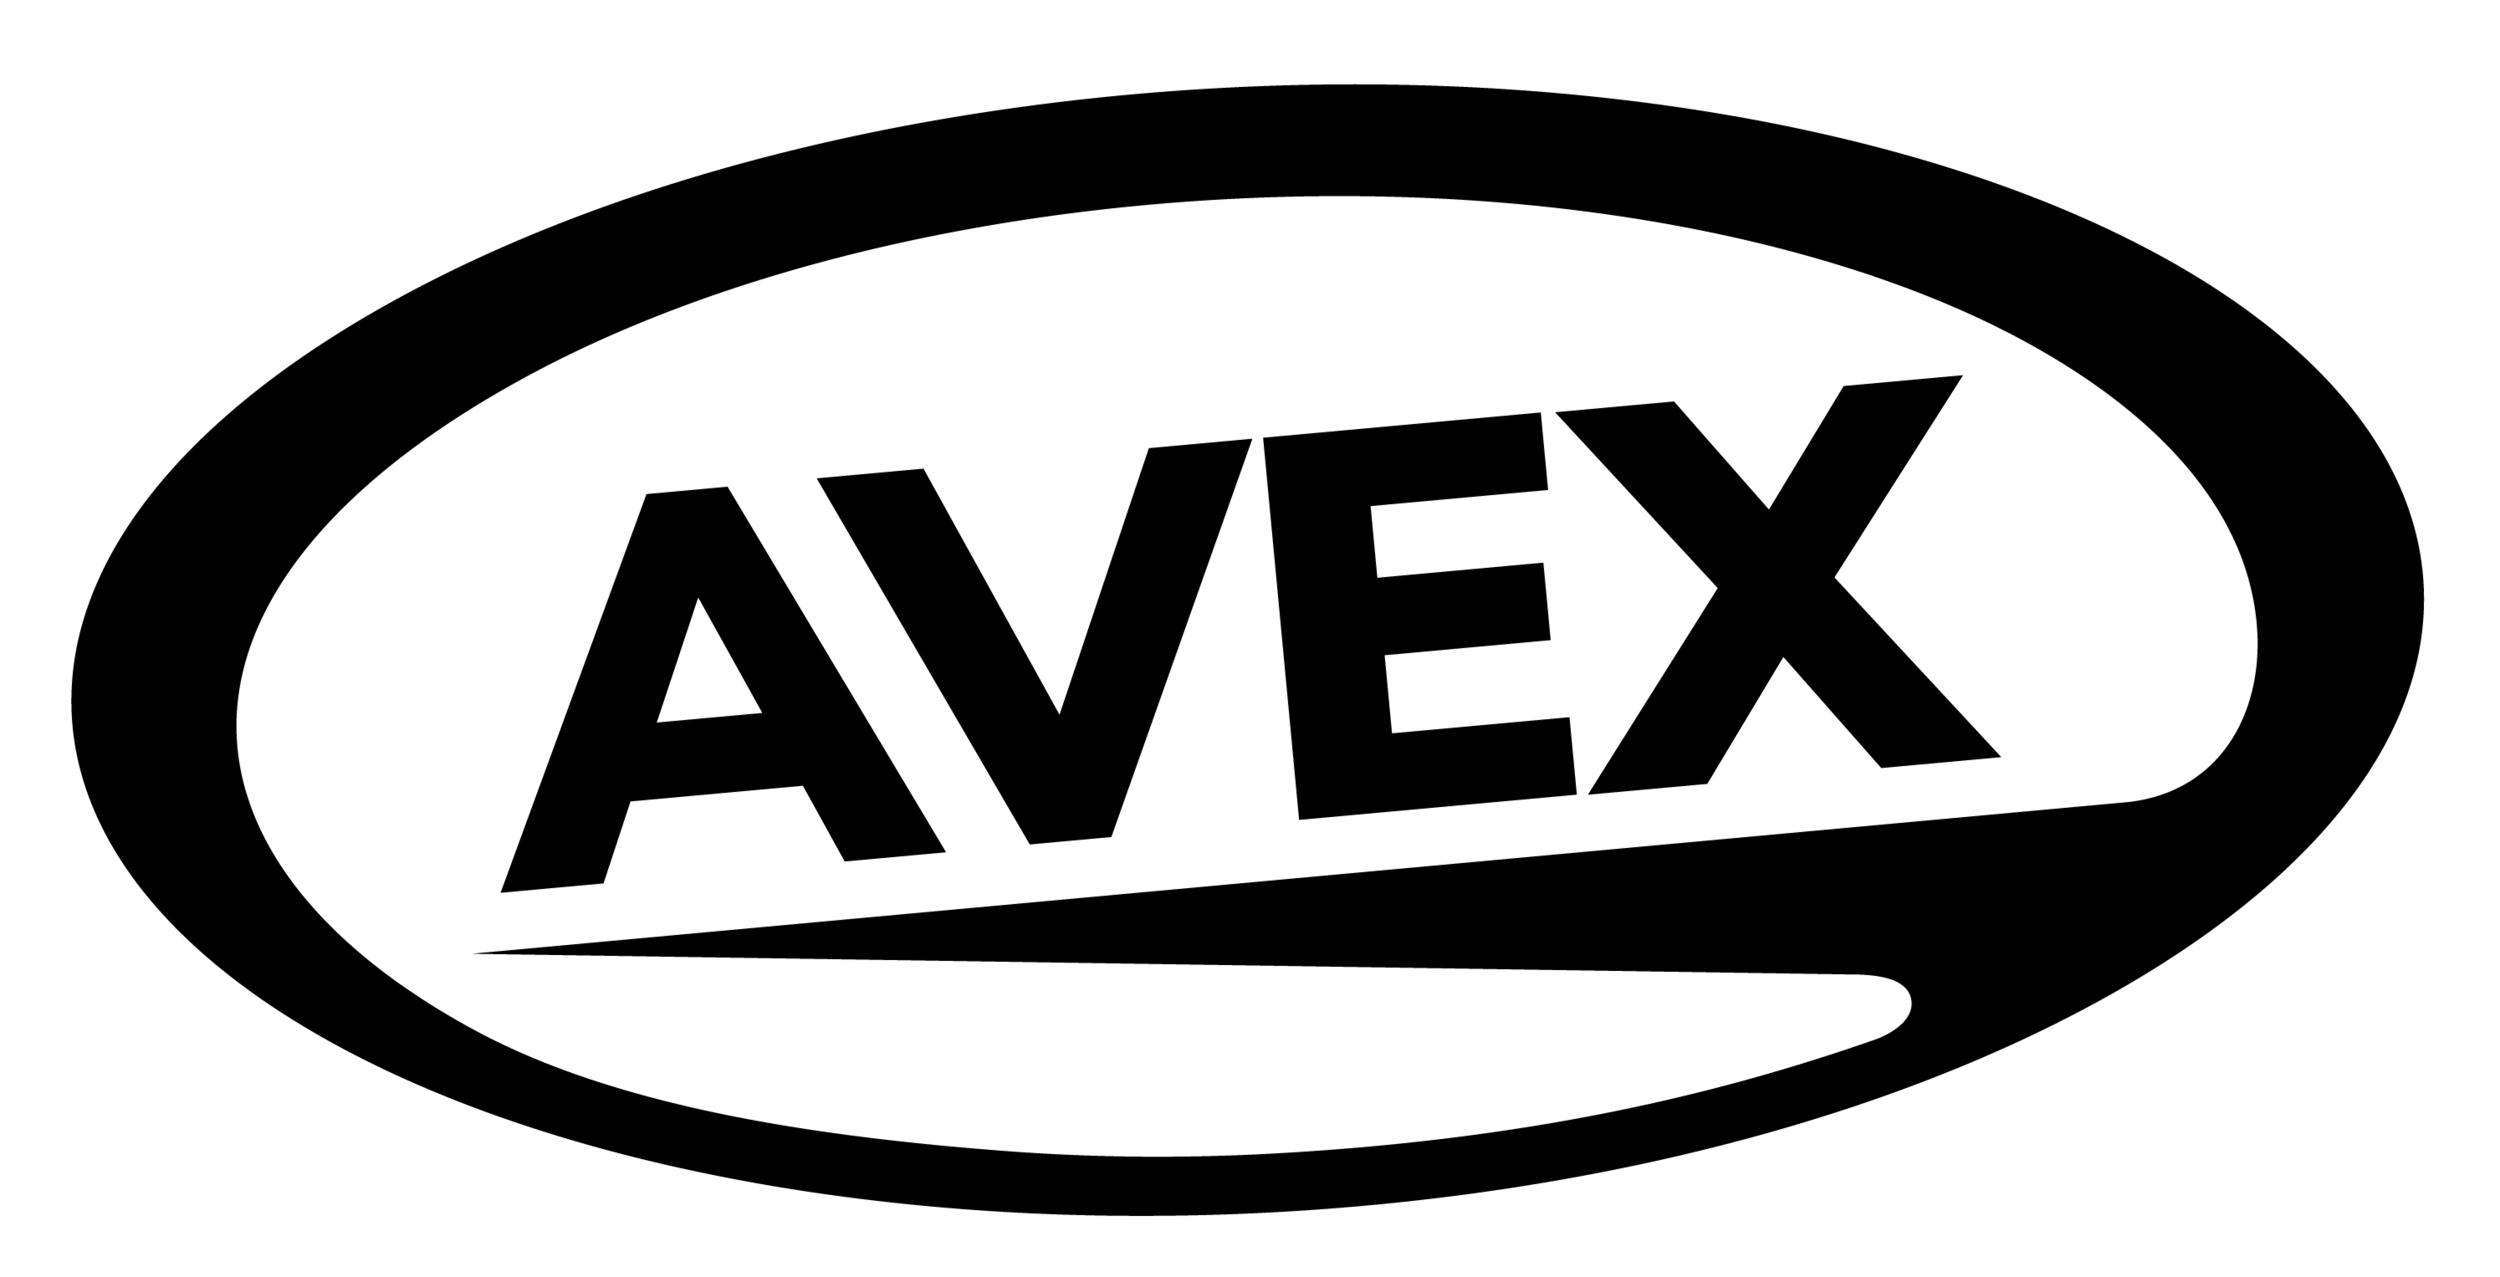 MASTER AVEX Logo 2019_Black.png